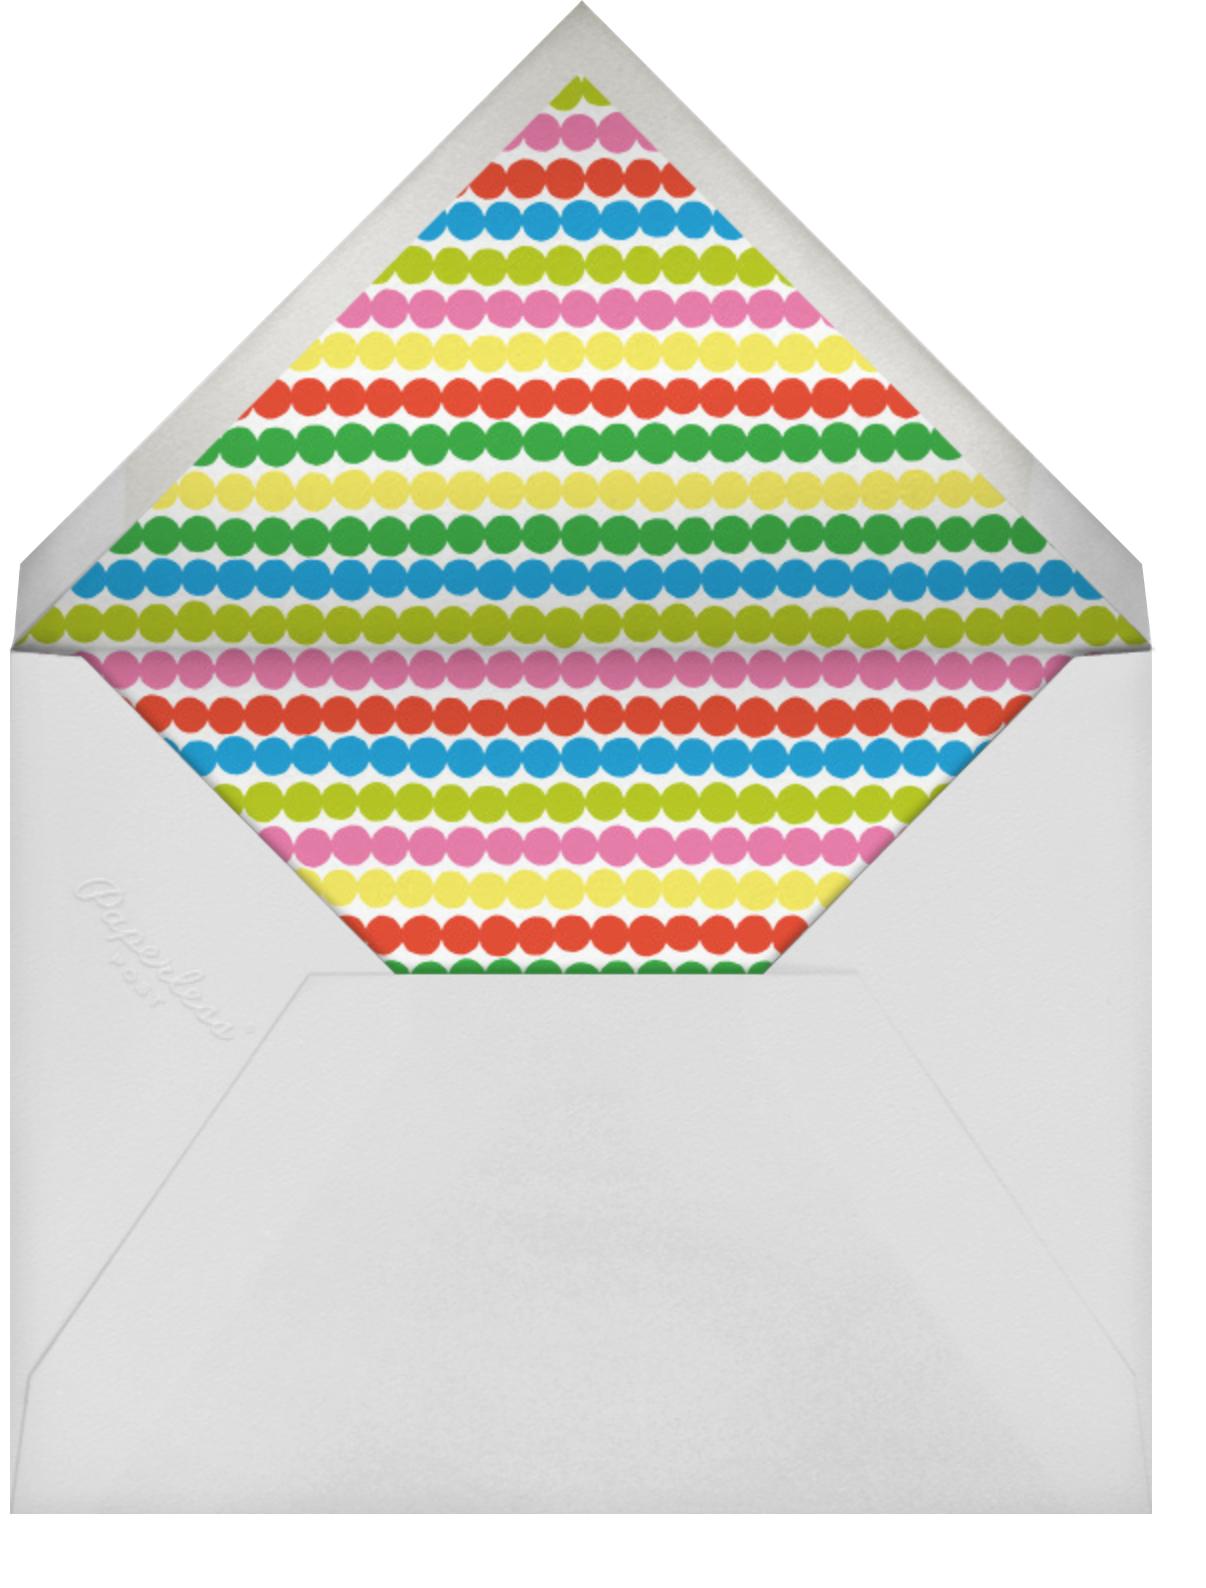 Karkuteilla - Green - Marimekko - Baby shower - envelope back